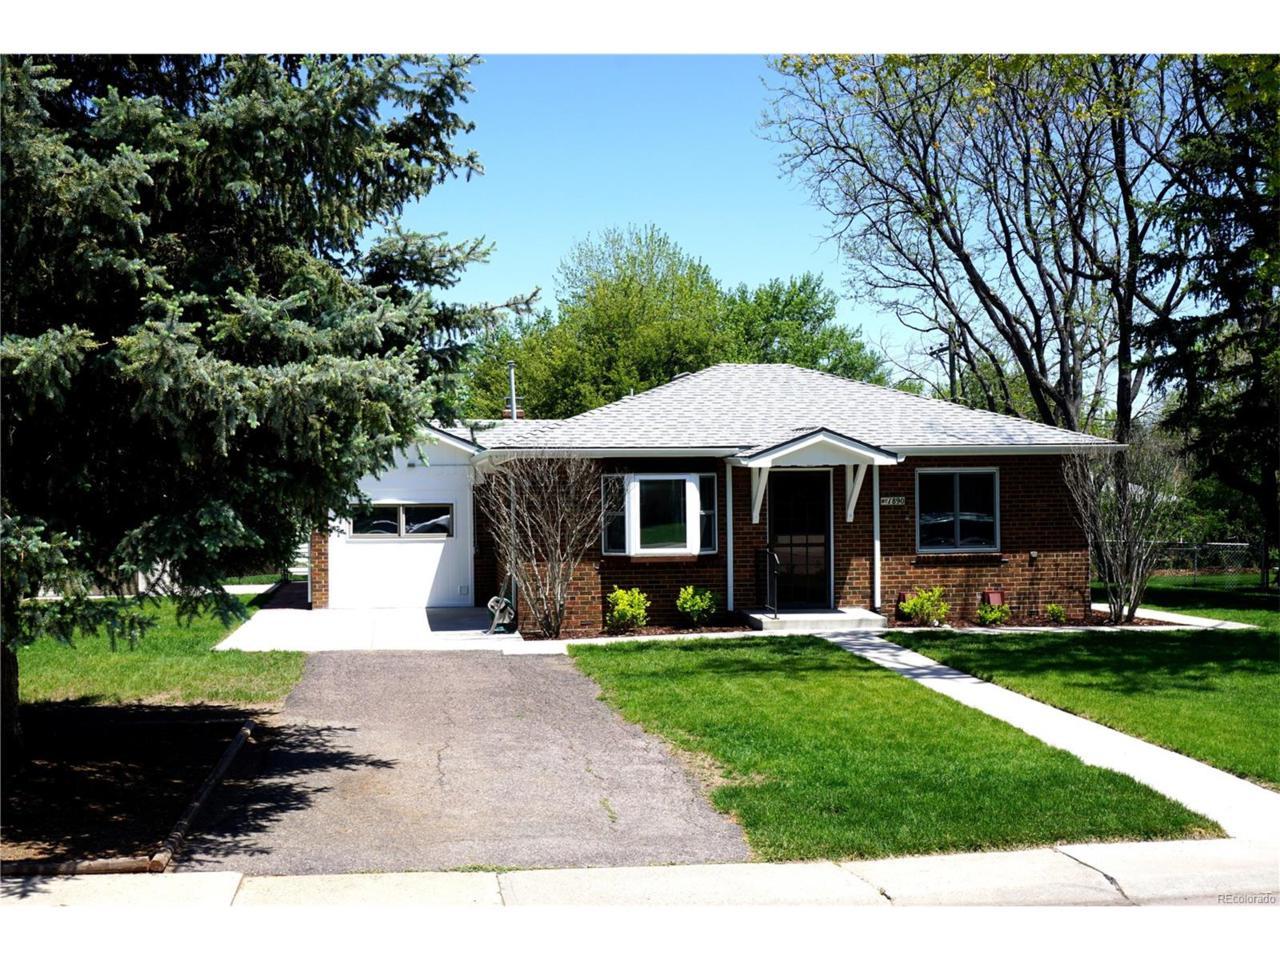 1890 Cody Street, Lakewood, CO 80215 (MLS #4229327) :: 8z Real Estate